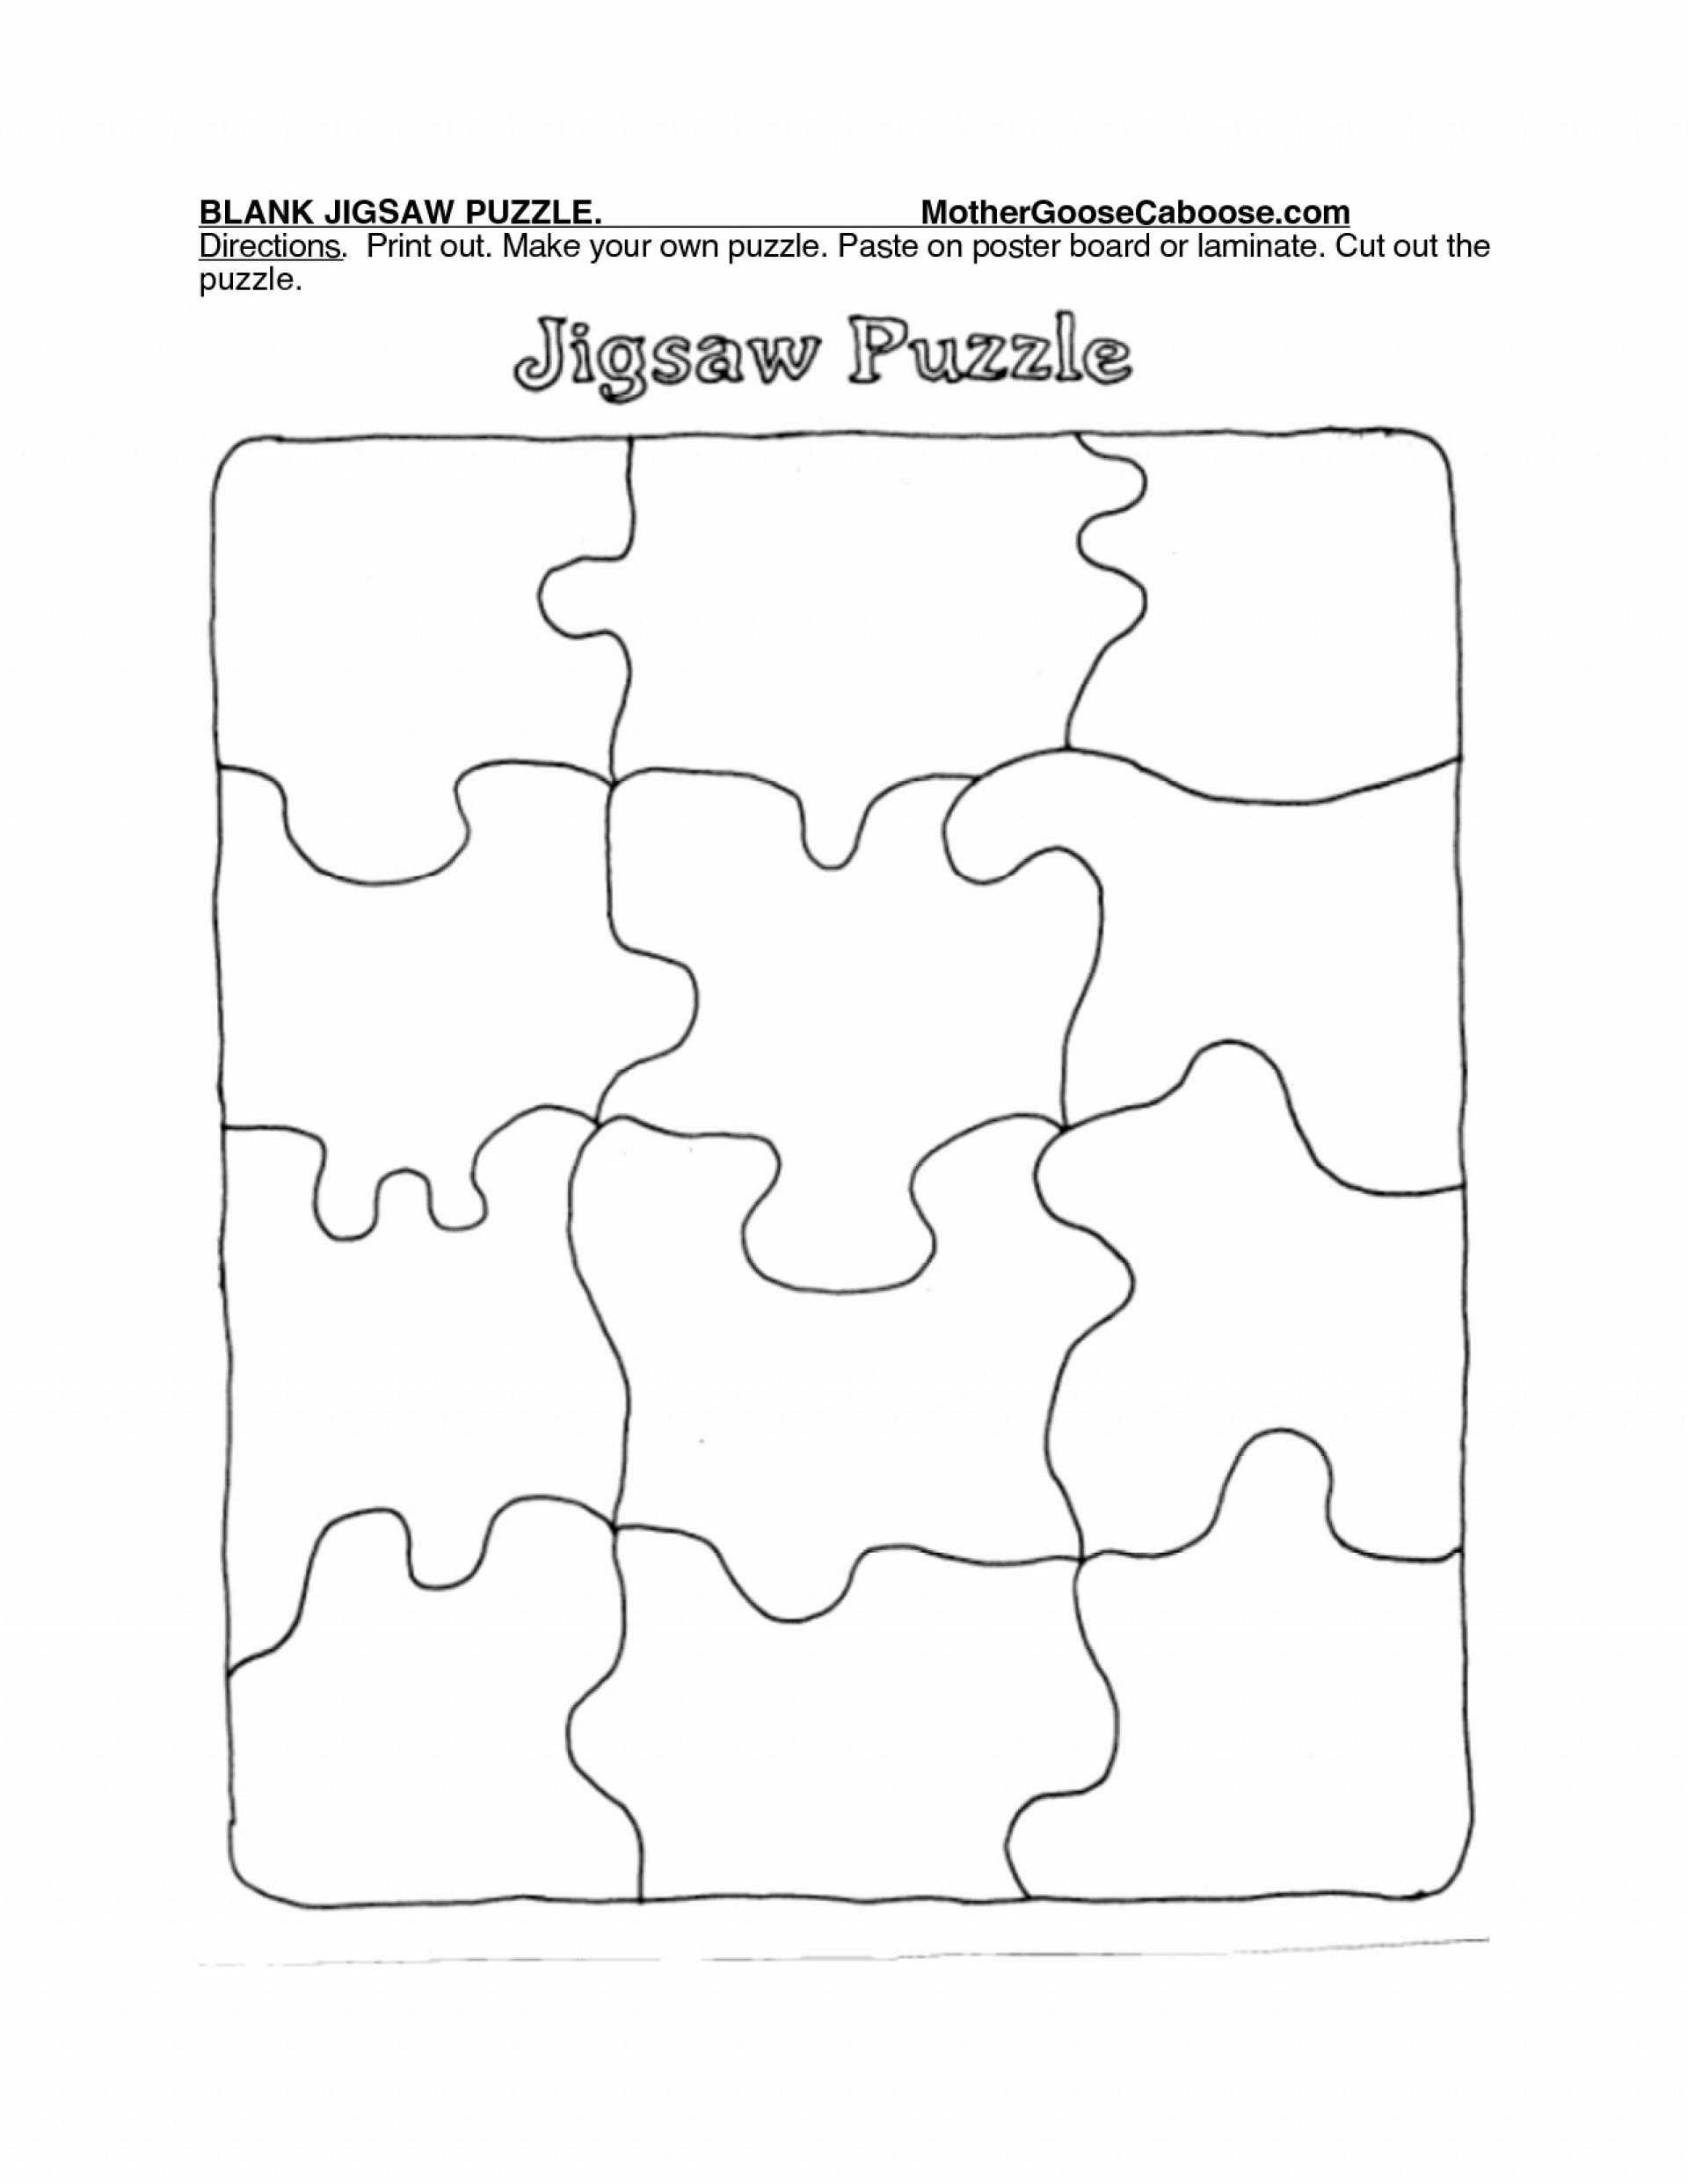 019 Blank Puzzle Pieceste Piece Powerpoint Free Pdf Ppt Smartart - 8 Piece Puzzle Printable